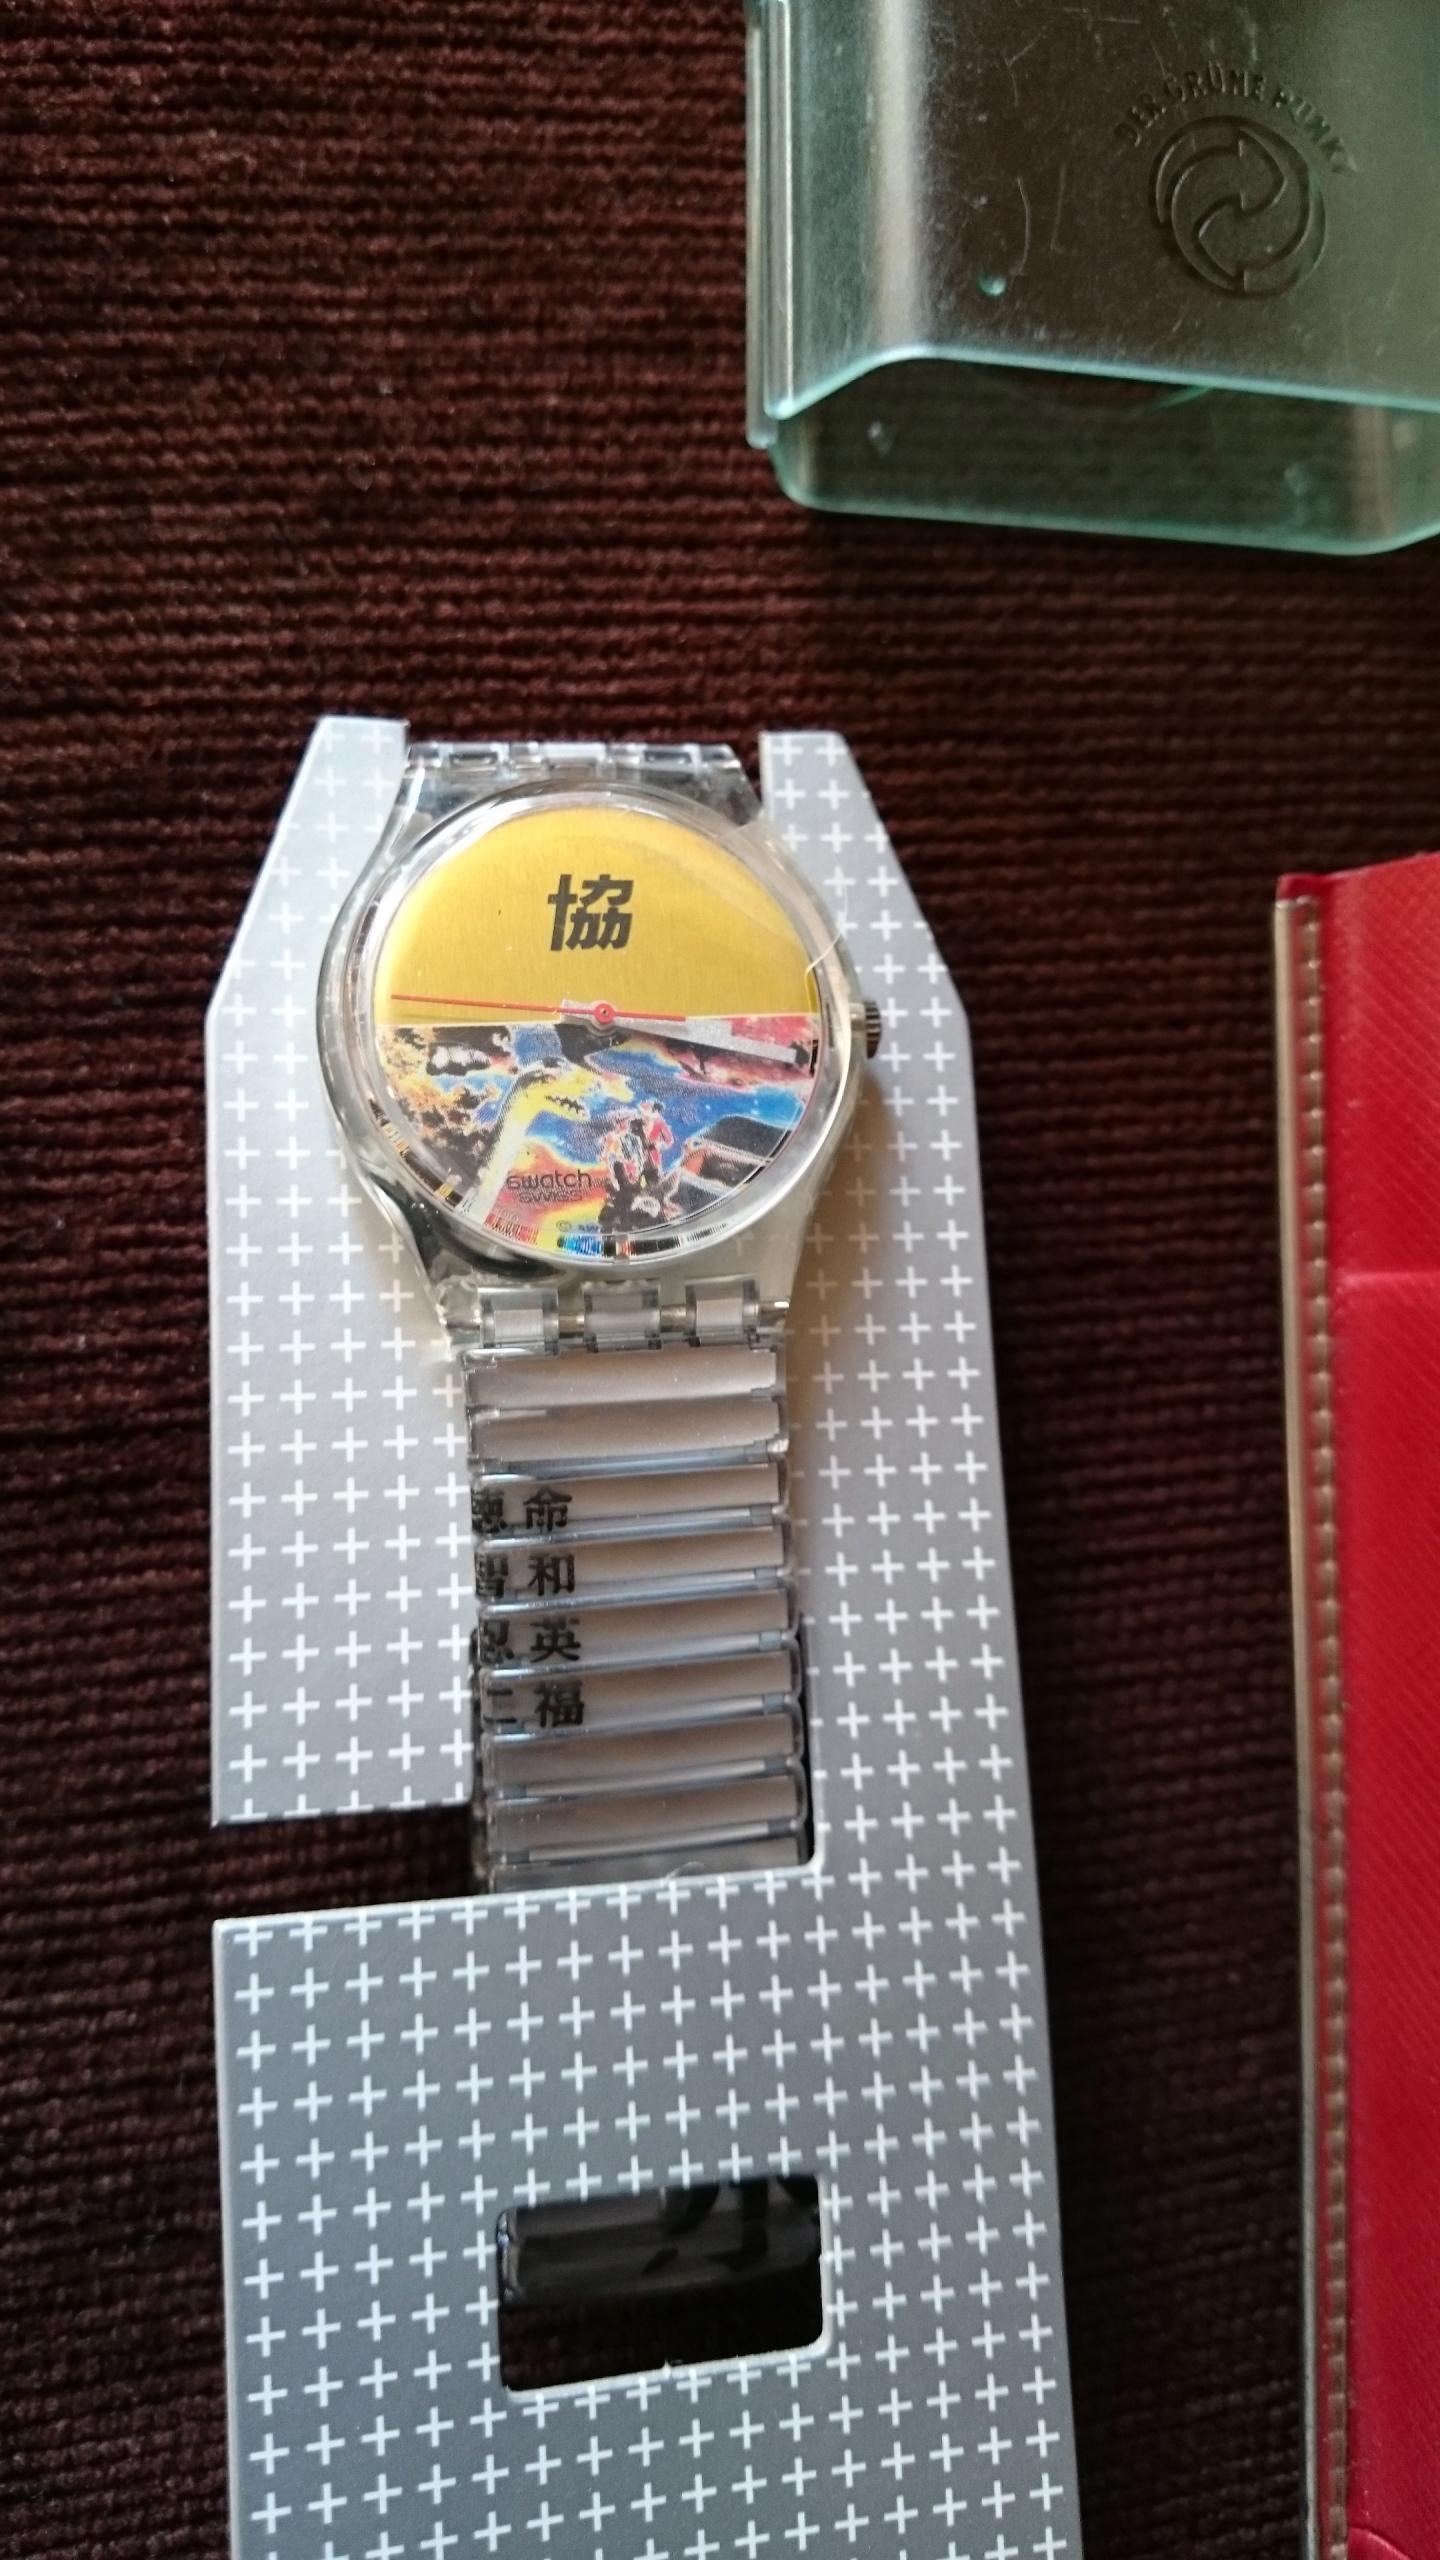 Zegar Swatch GK219 Godzilla Swiss Made Japan 90'